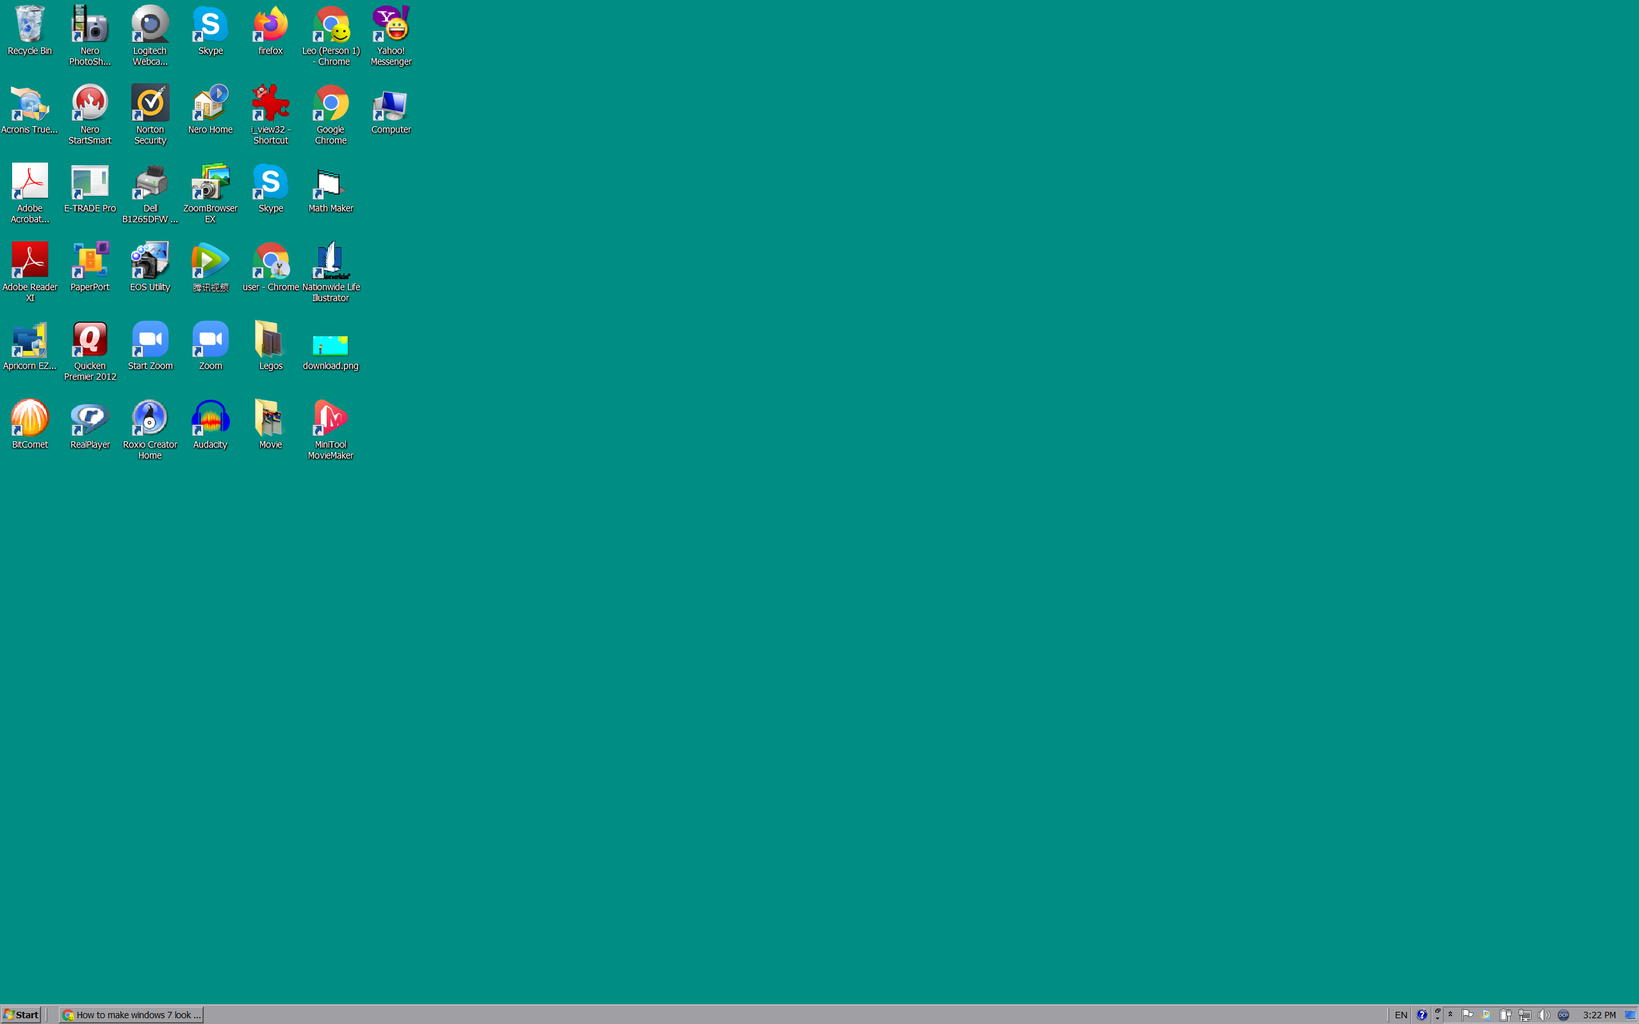 How to Make Windows 7 Look Like Windows 95